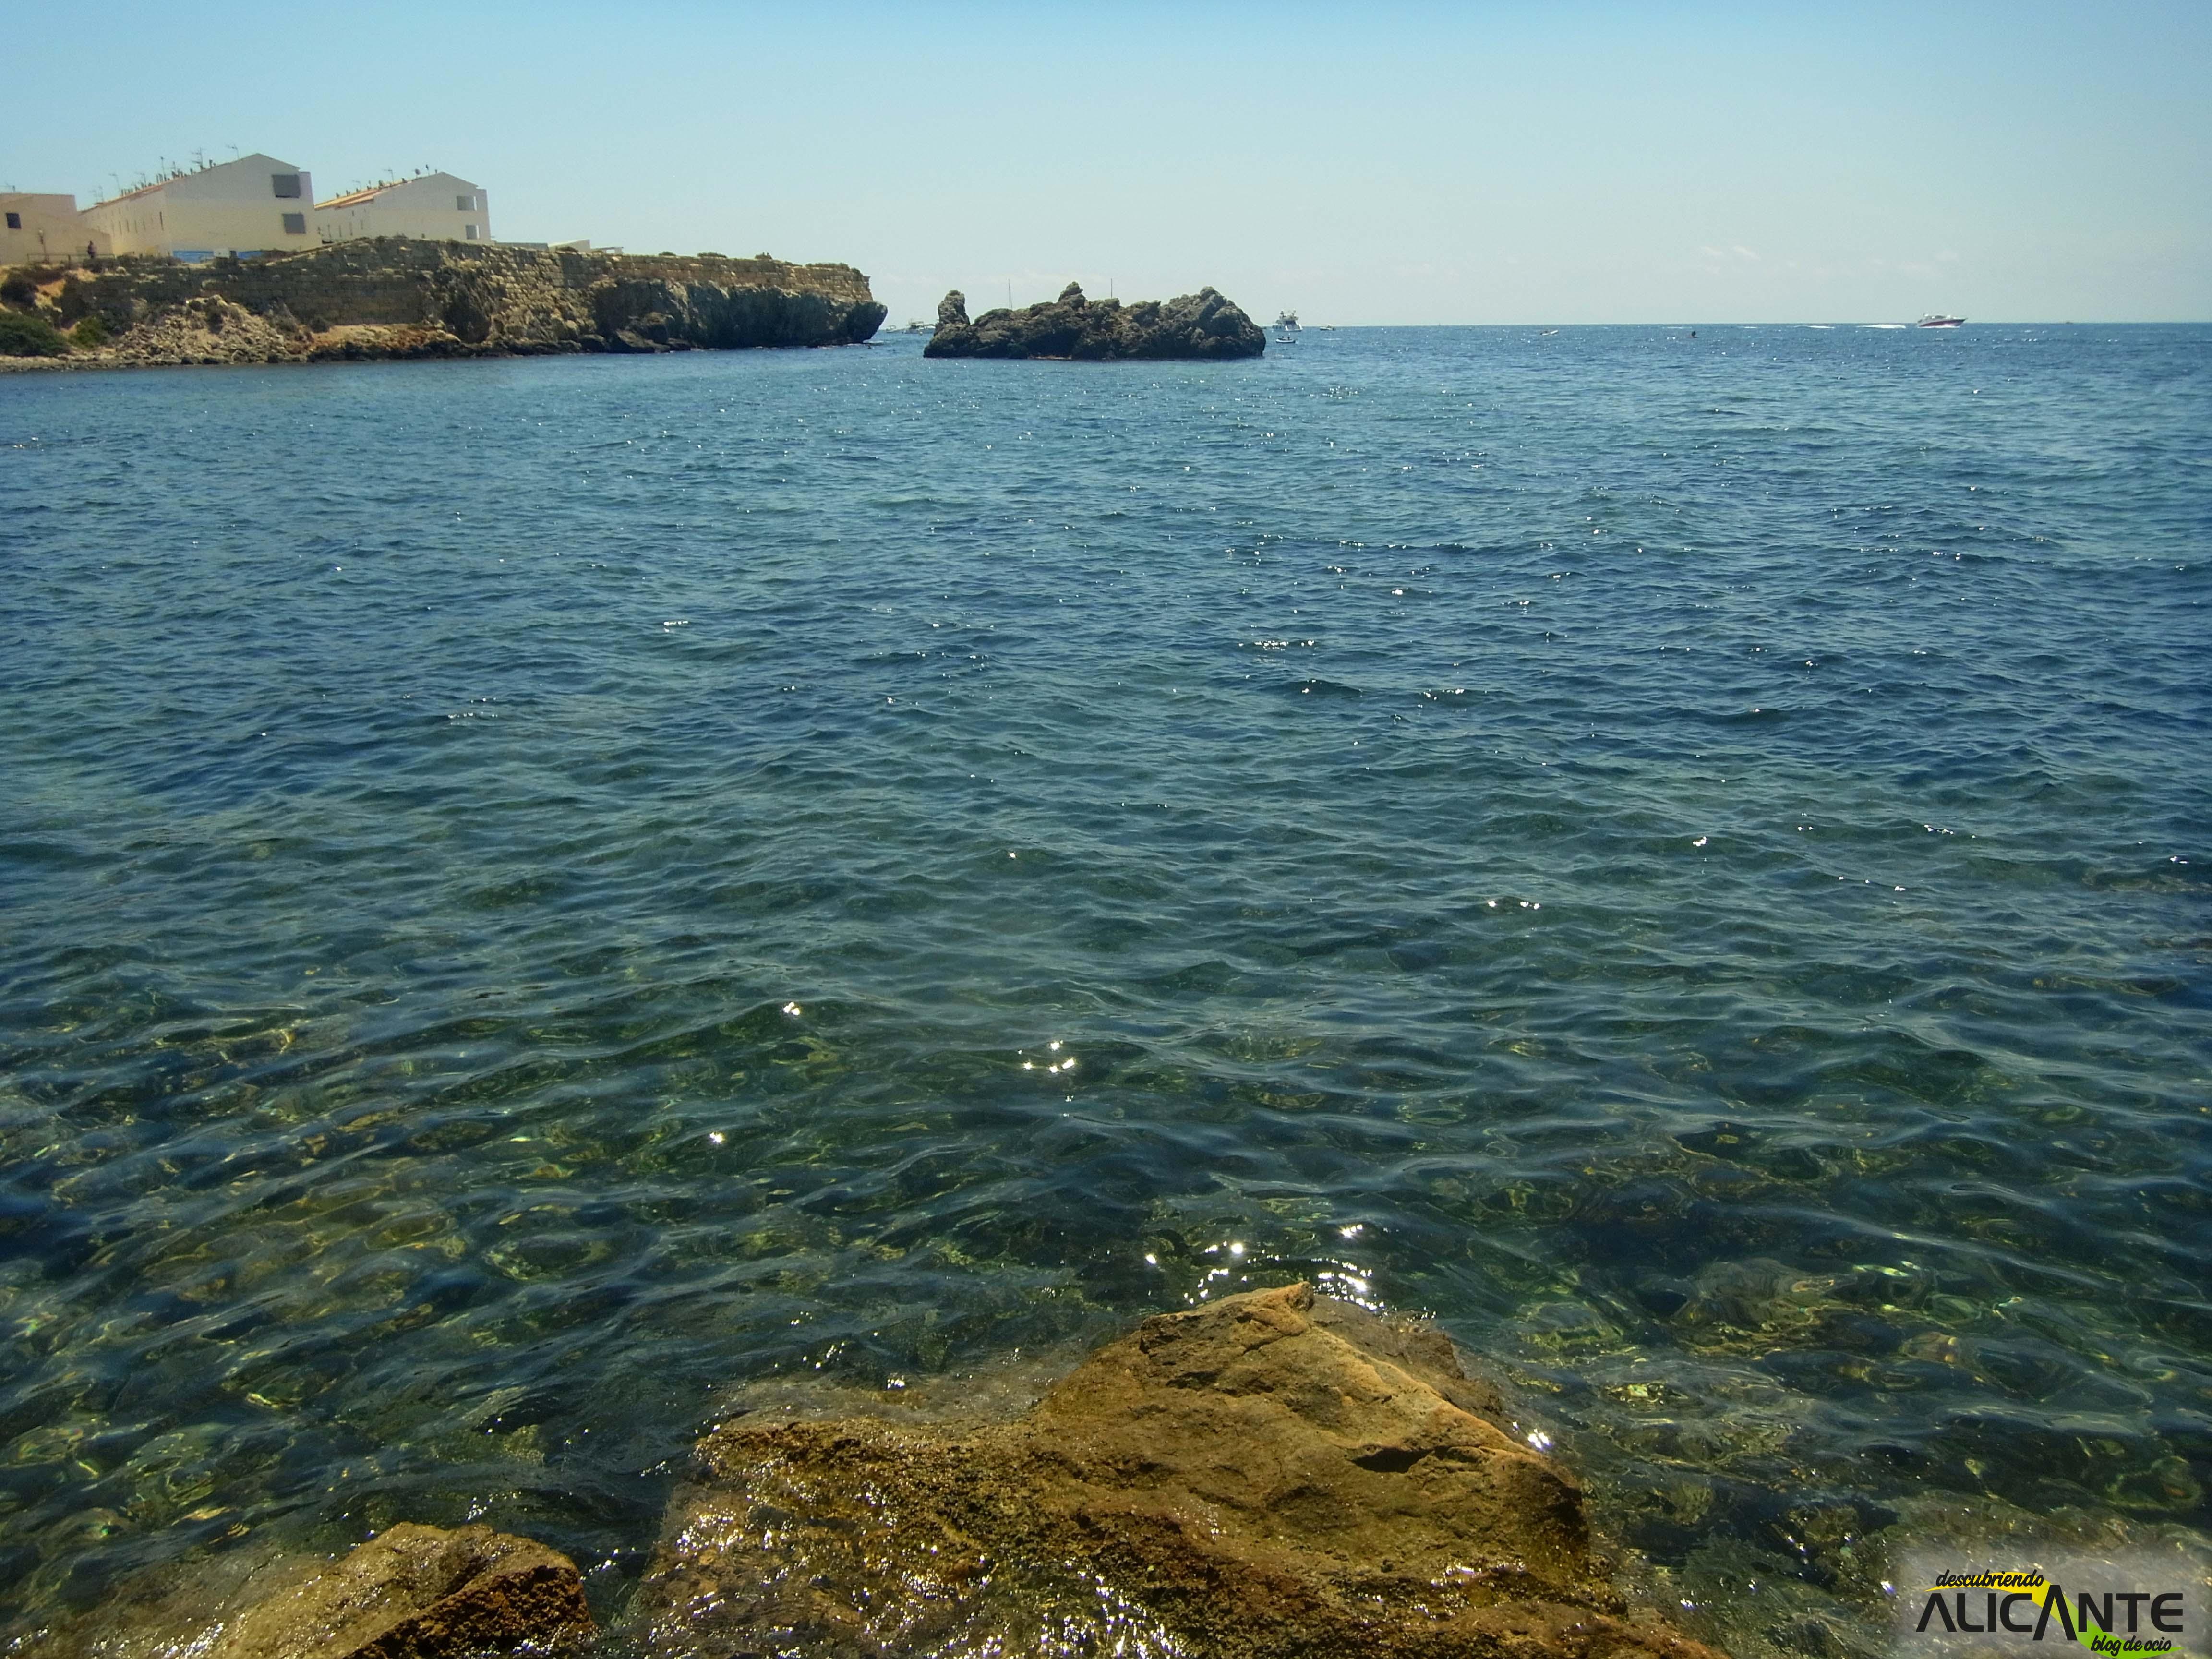 isla-de-tabarca-2014-2